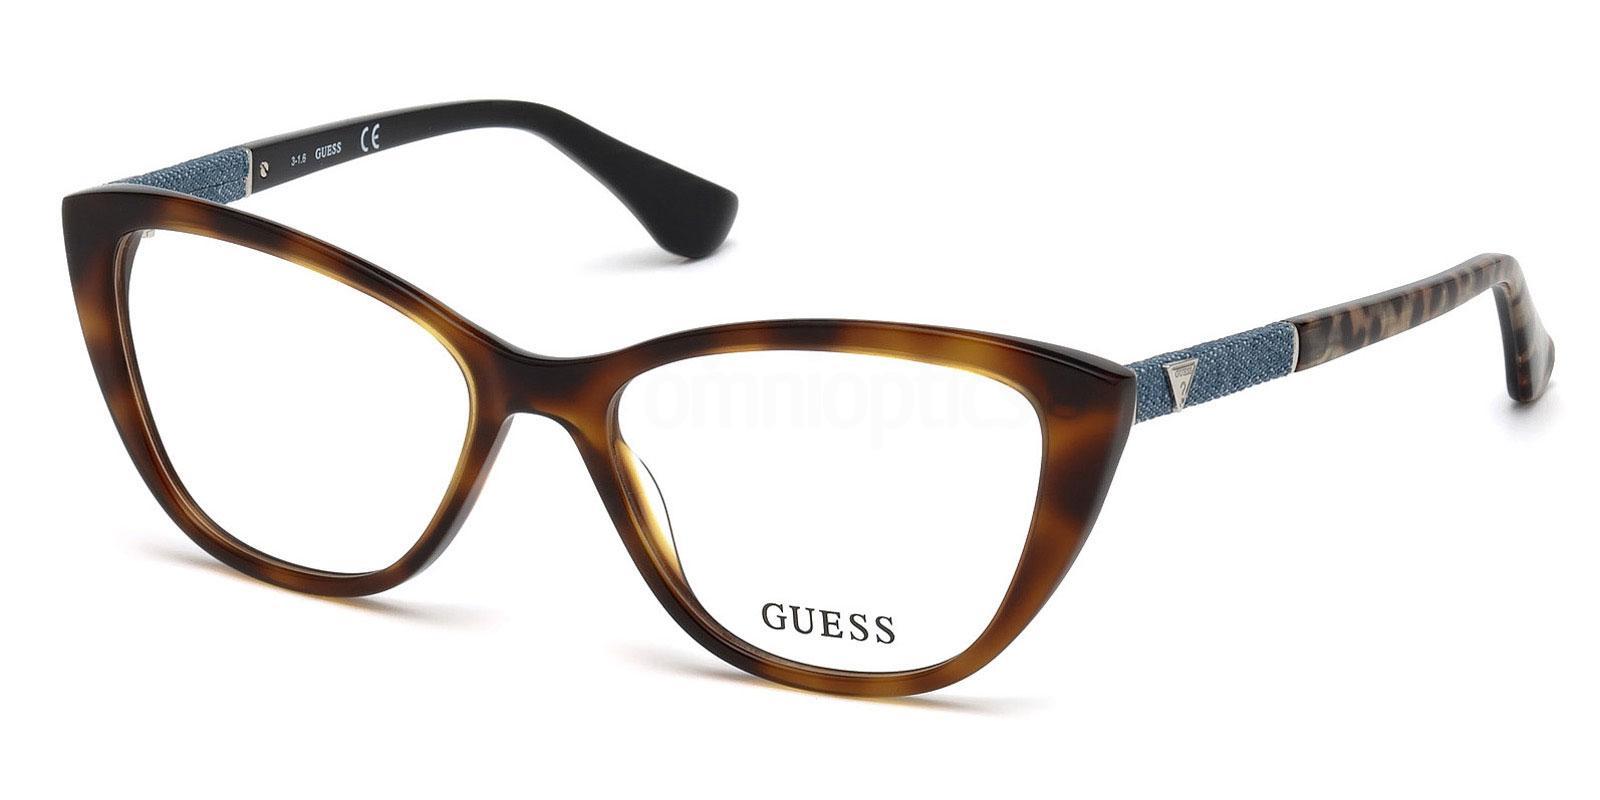 056 GU2593 , Guess